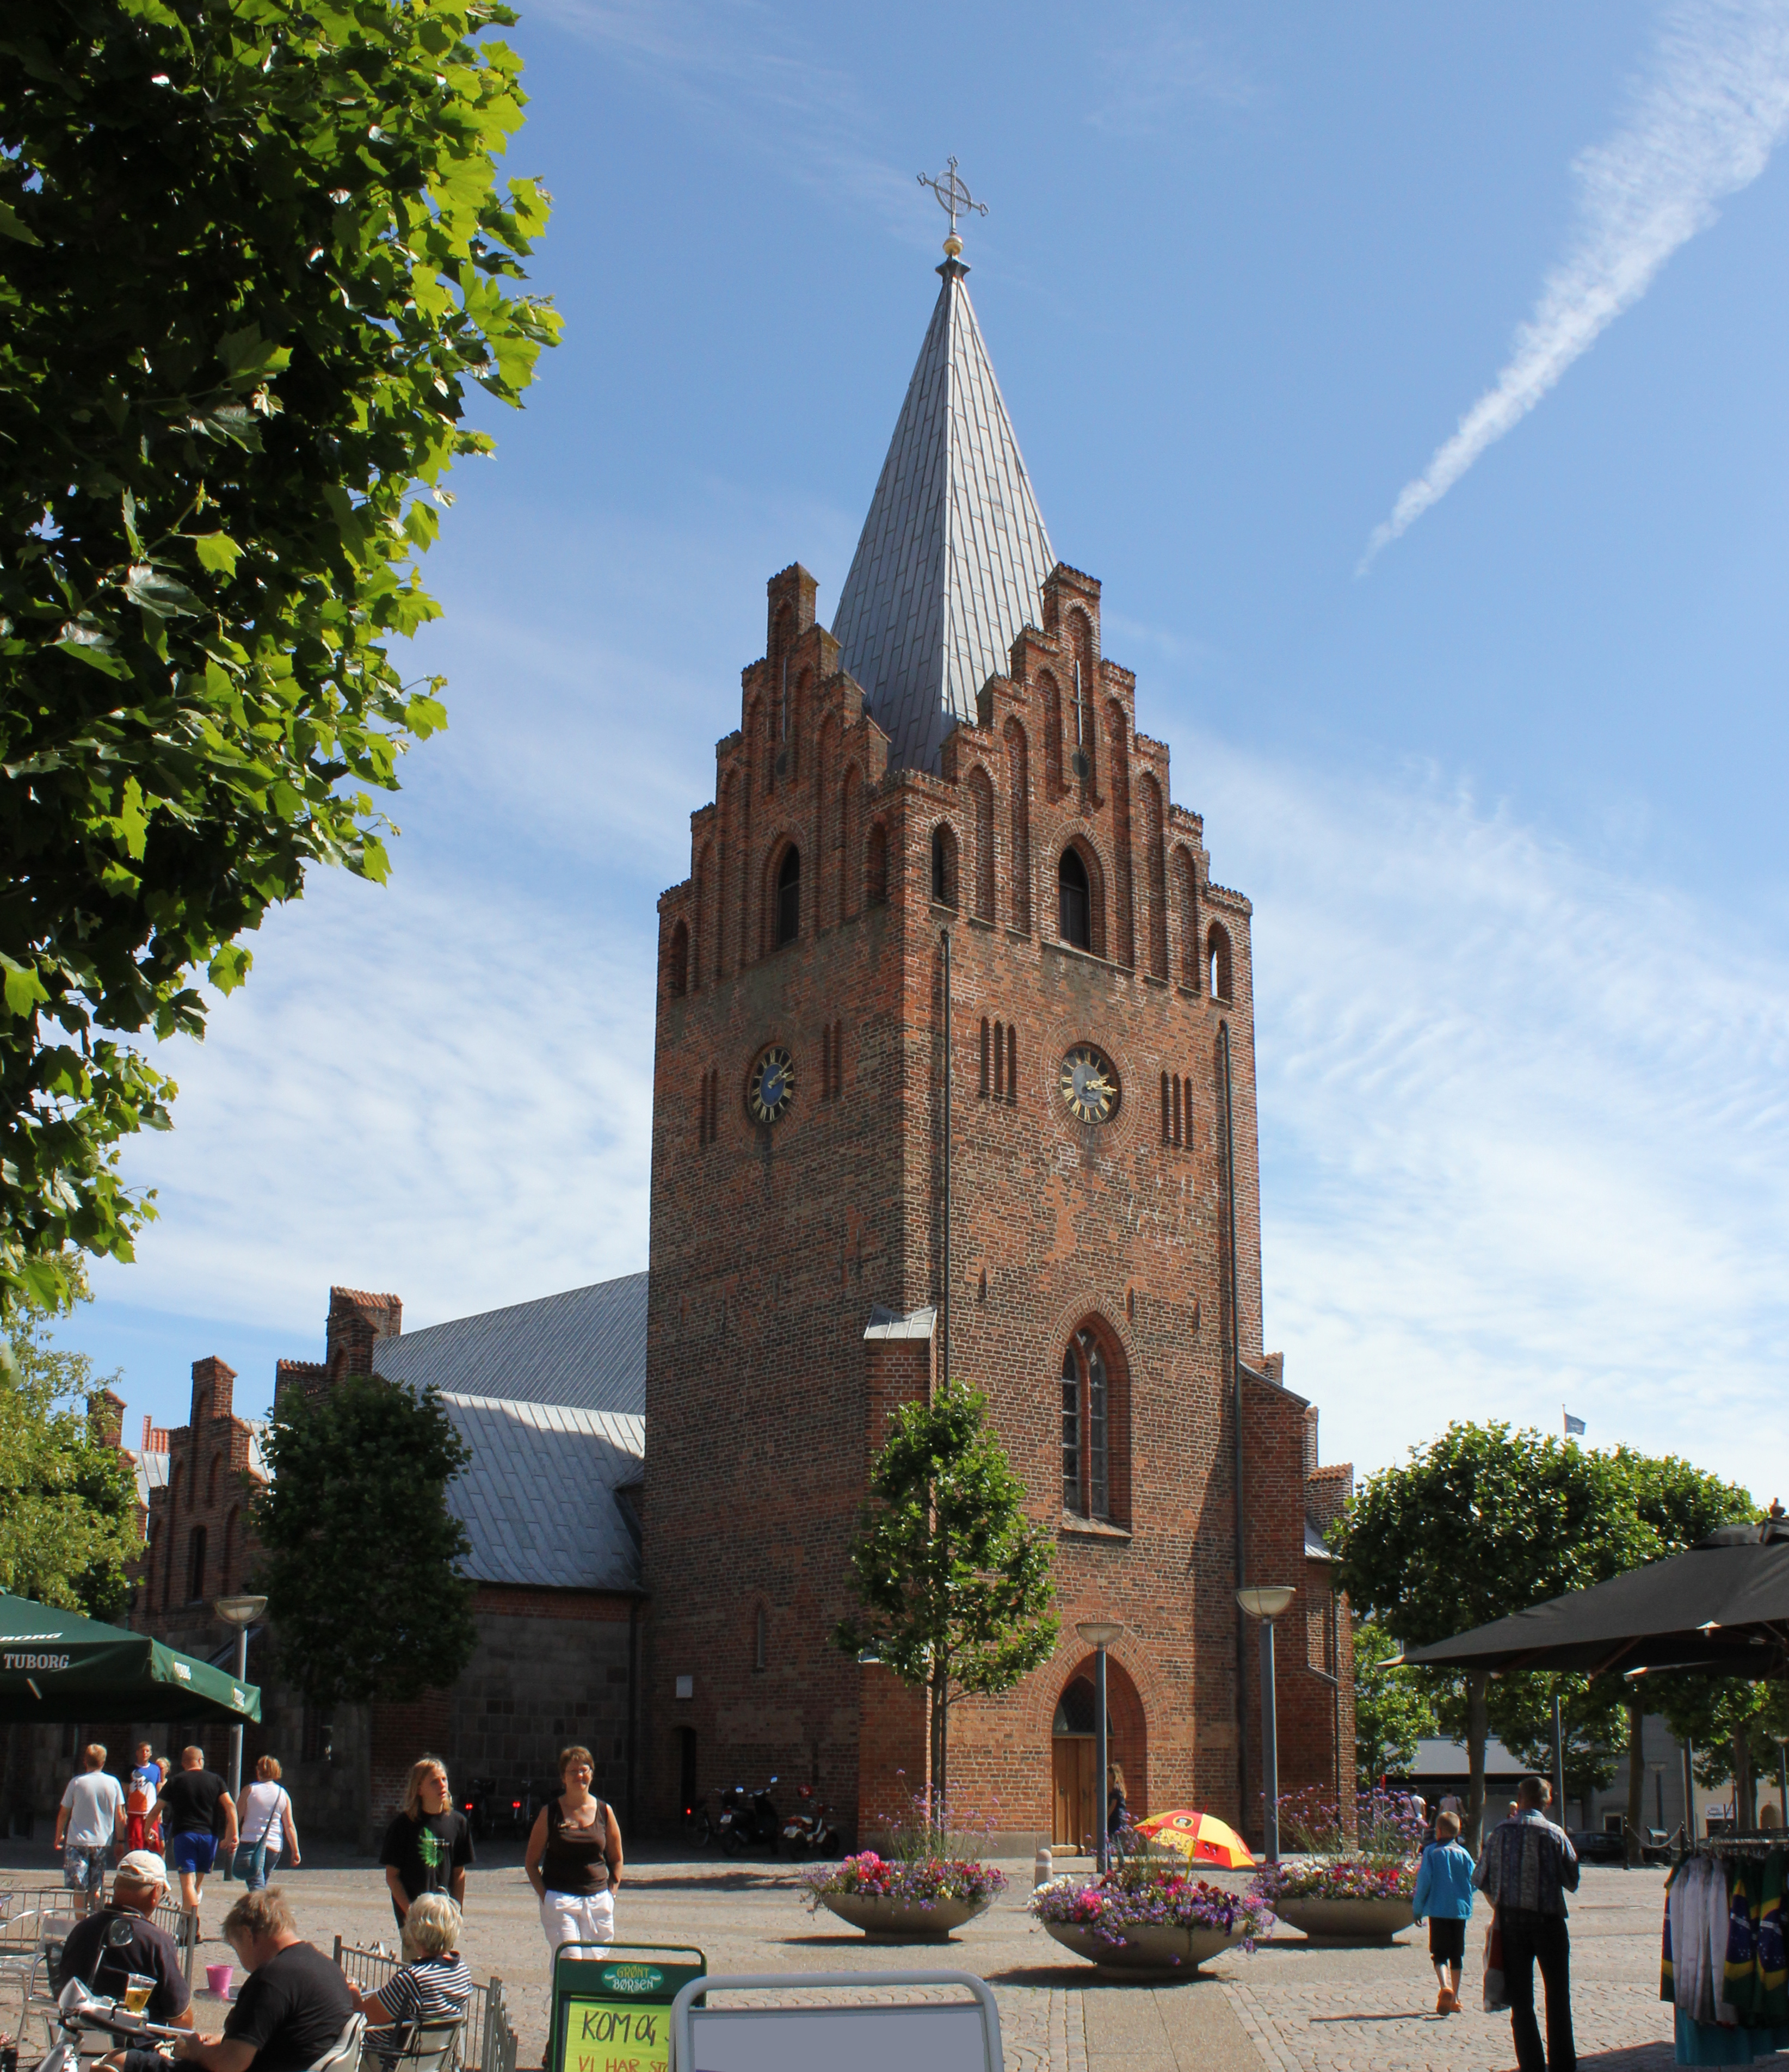 File:Sankt Gertruds kirke Church Grenaa Denmark 2010.JPG